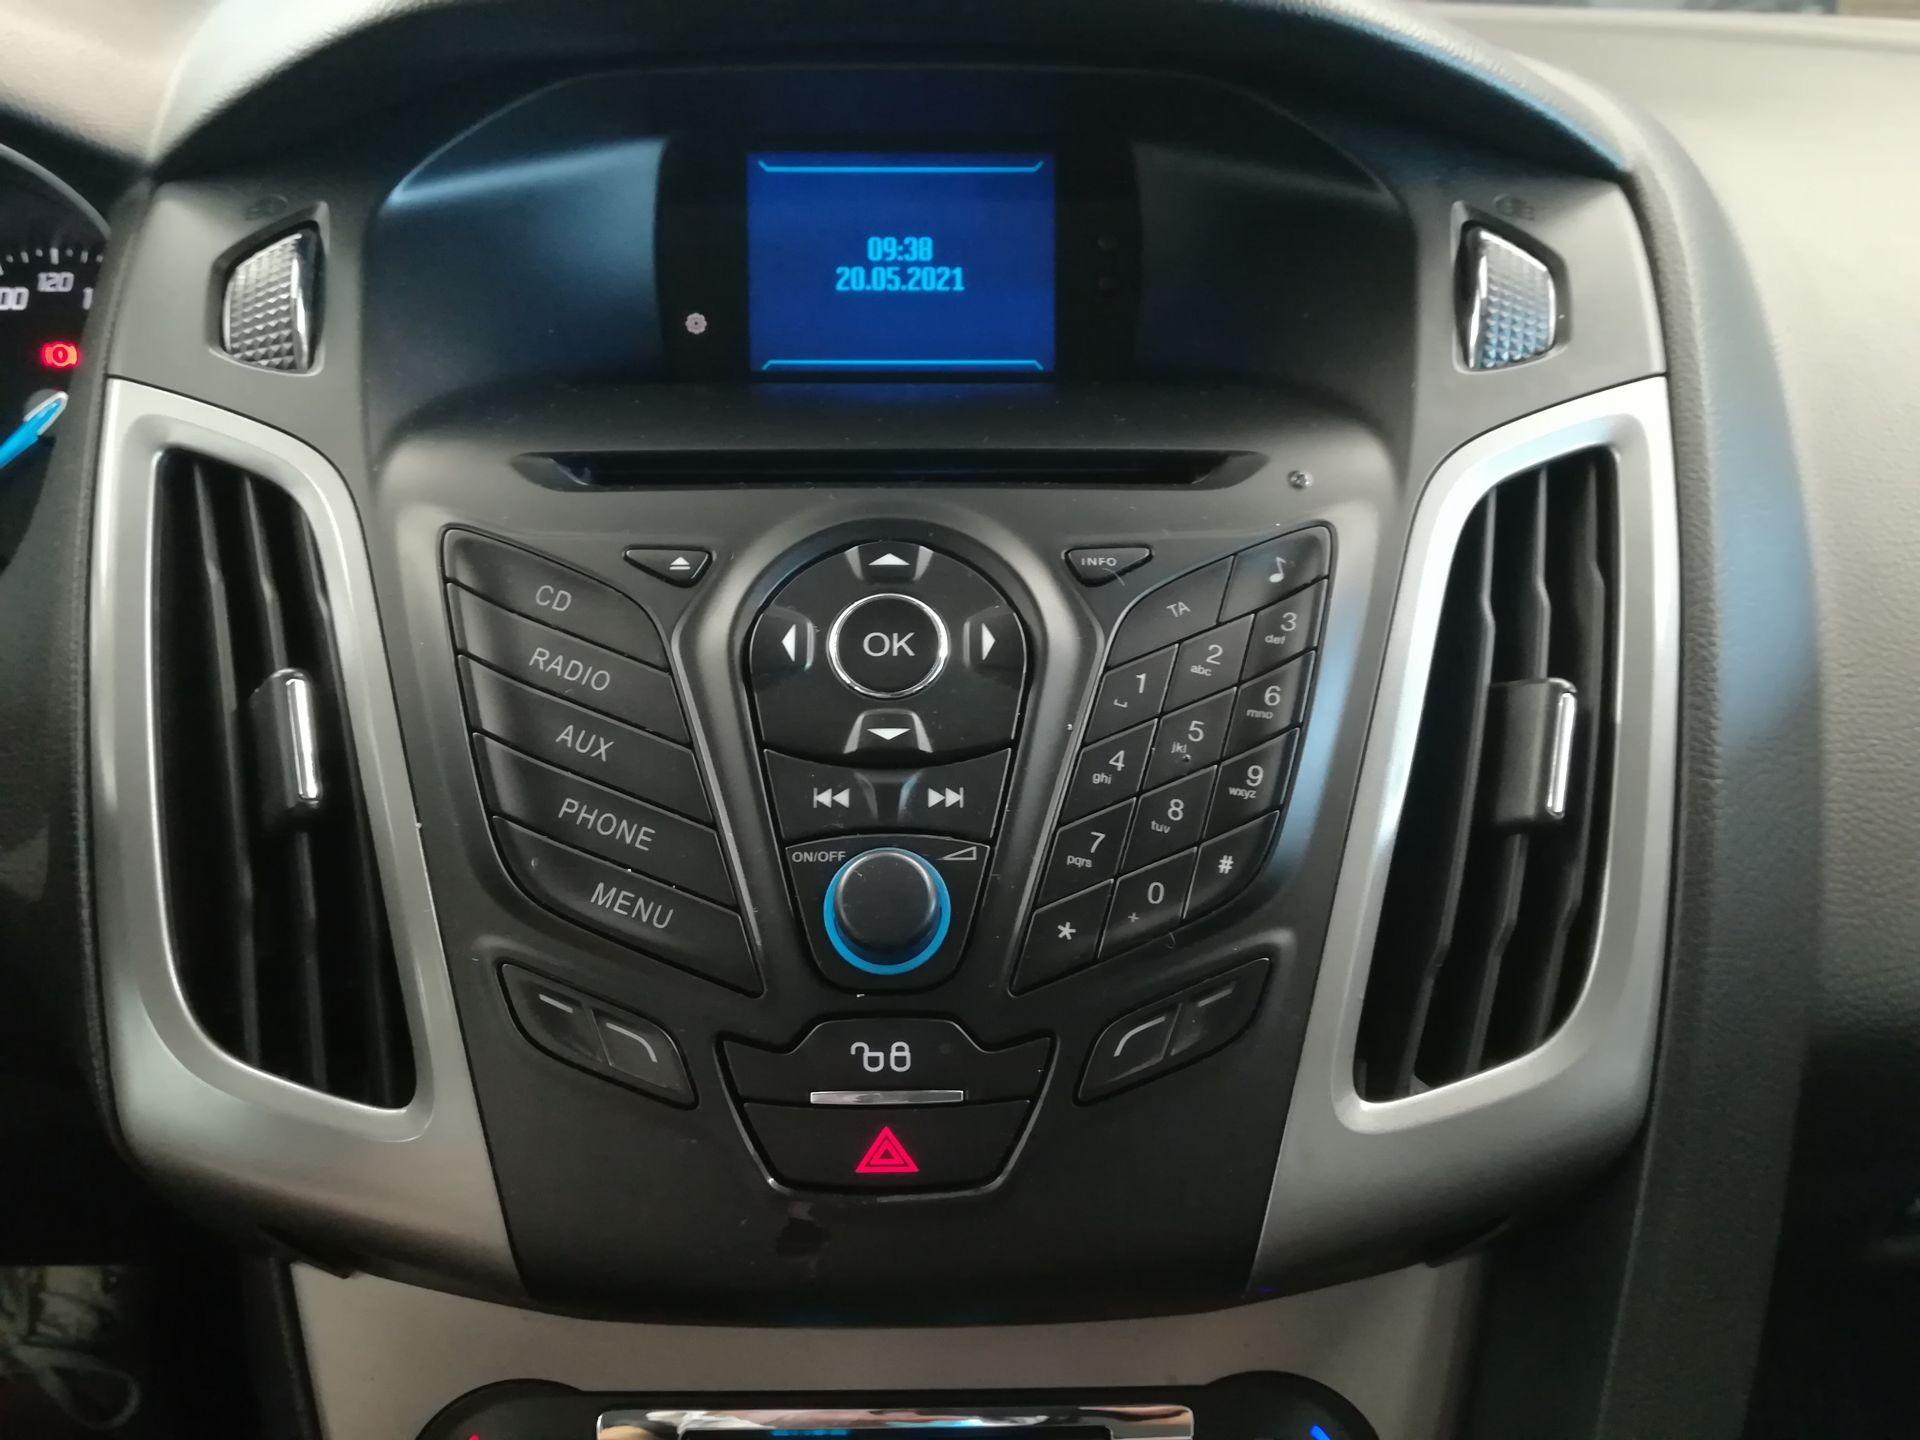 Ford Focus 1.6 TDCi 115cv Trend Sportbreak